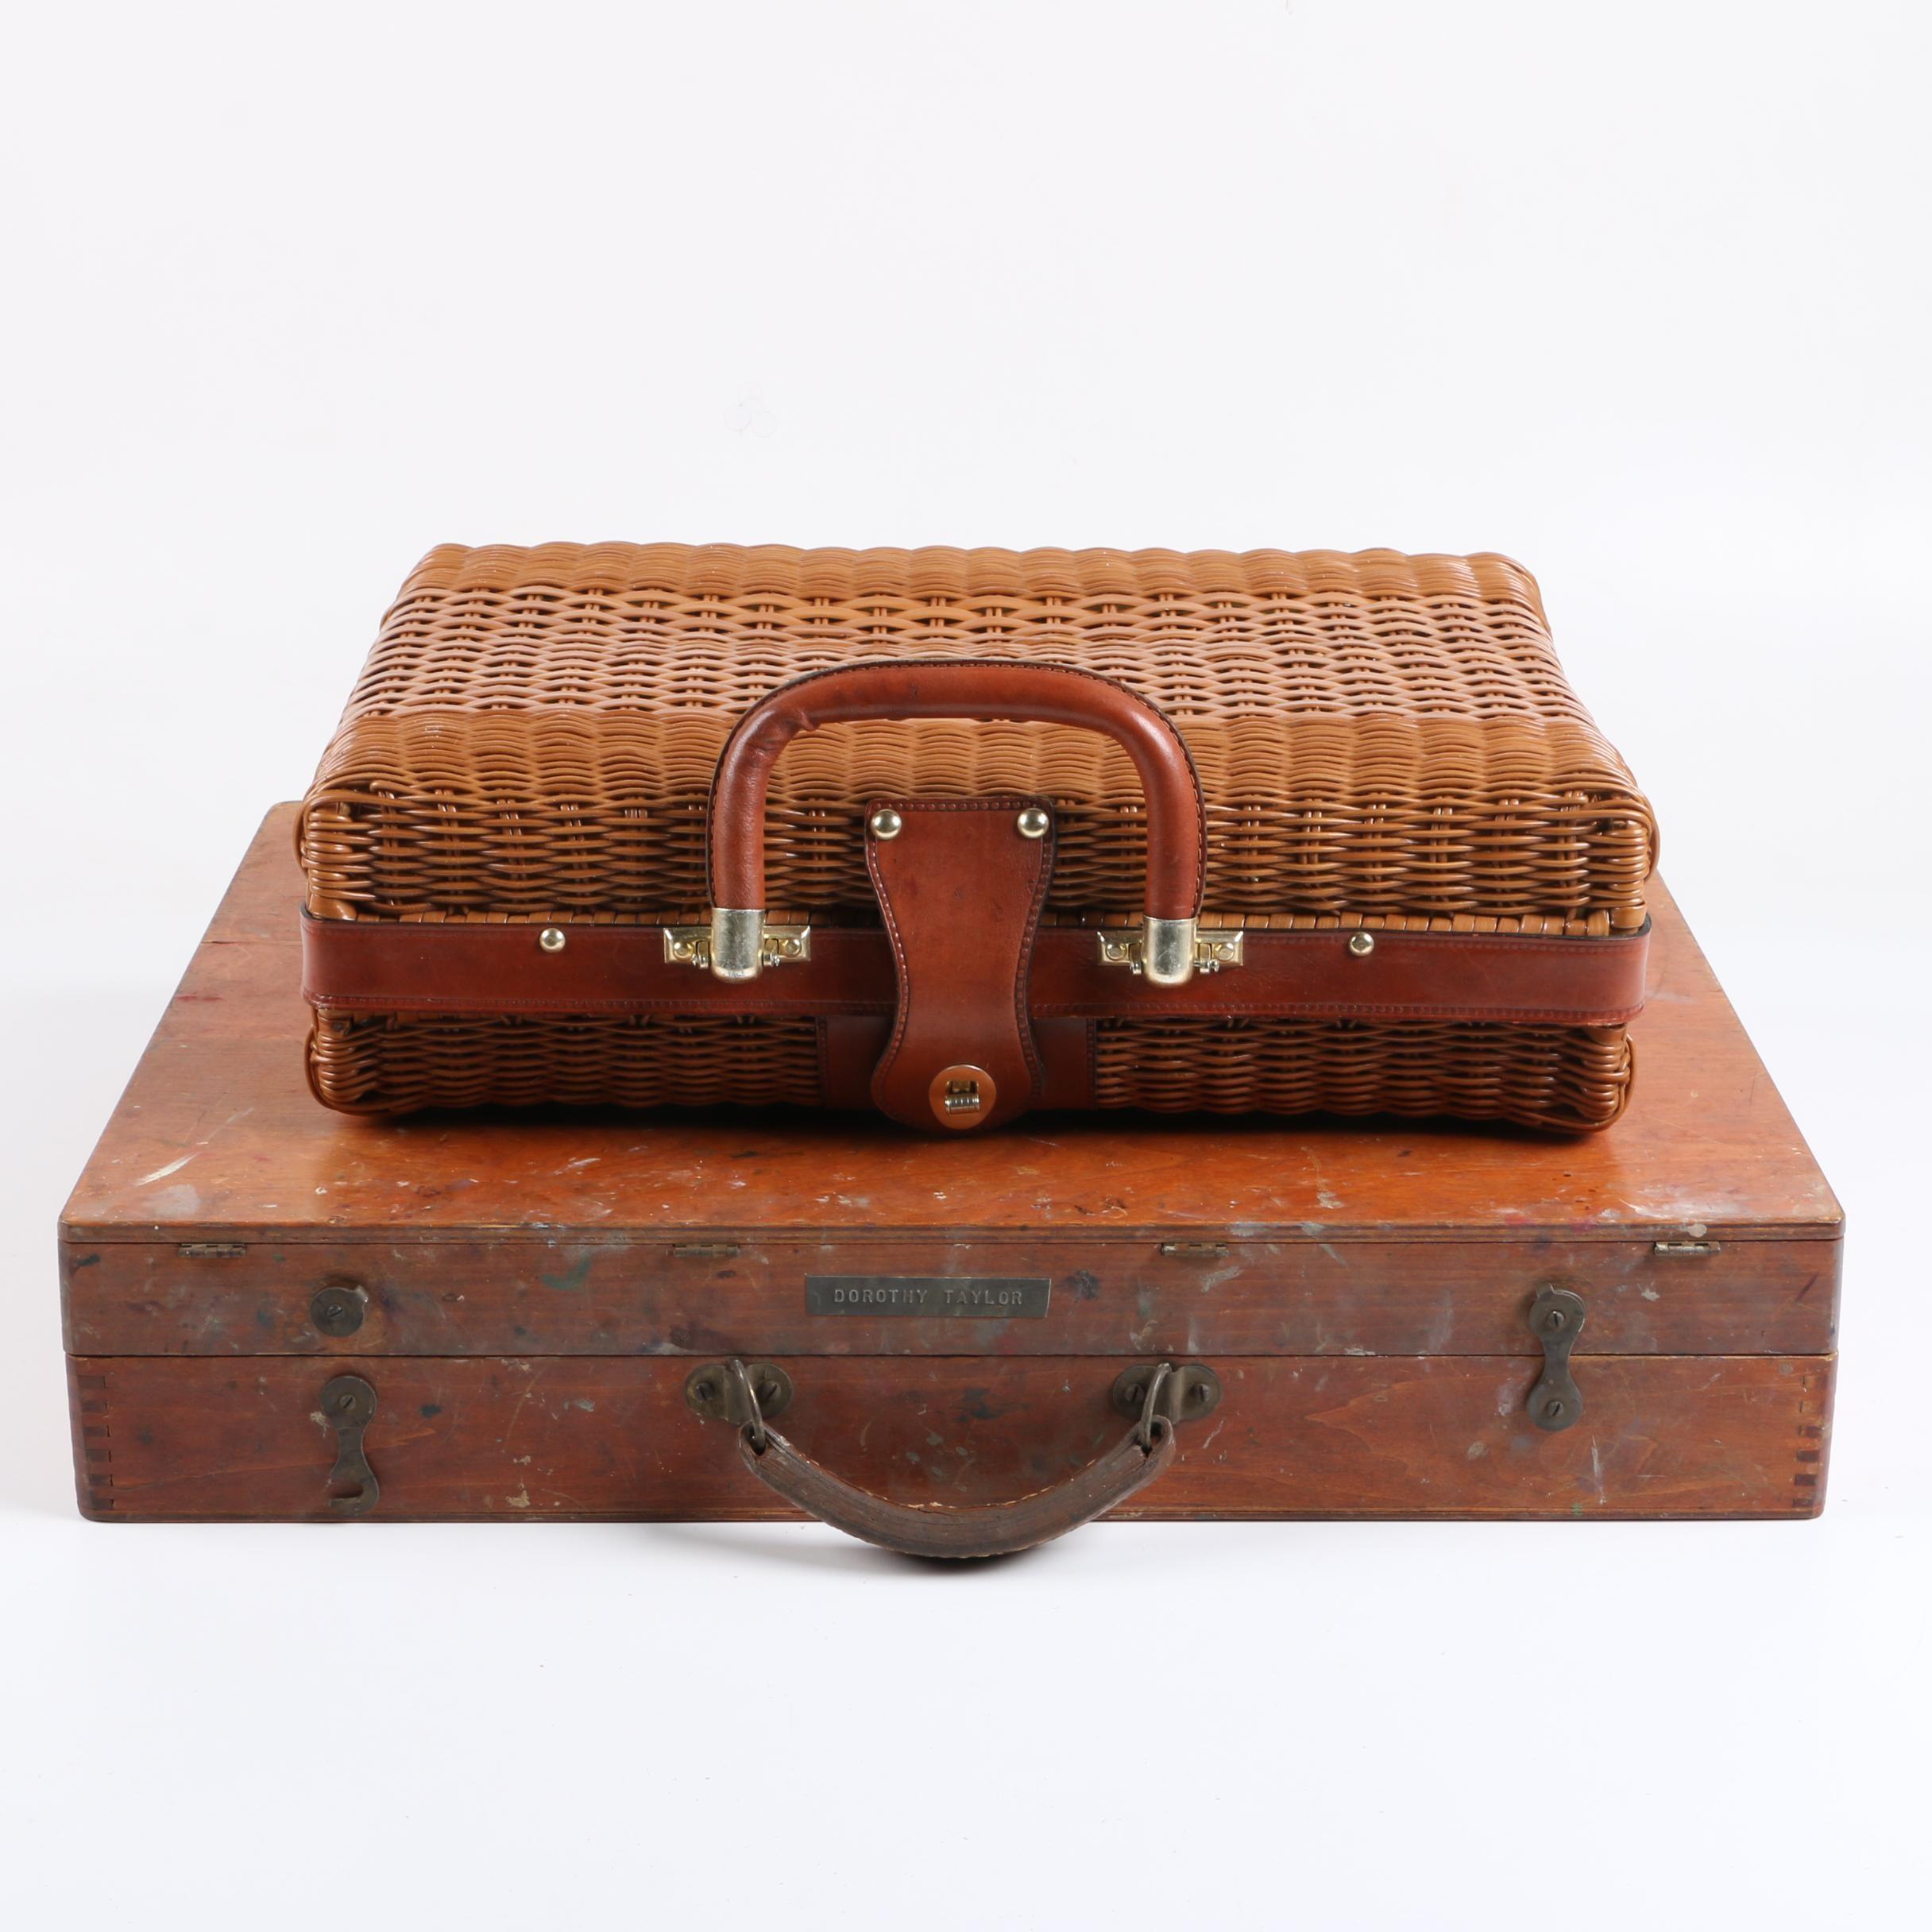 Artist's Vintage Portable Paint Box and Handmade Basket Handbag